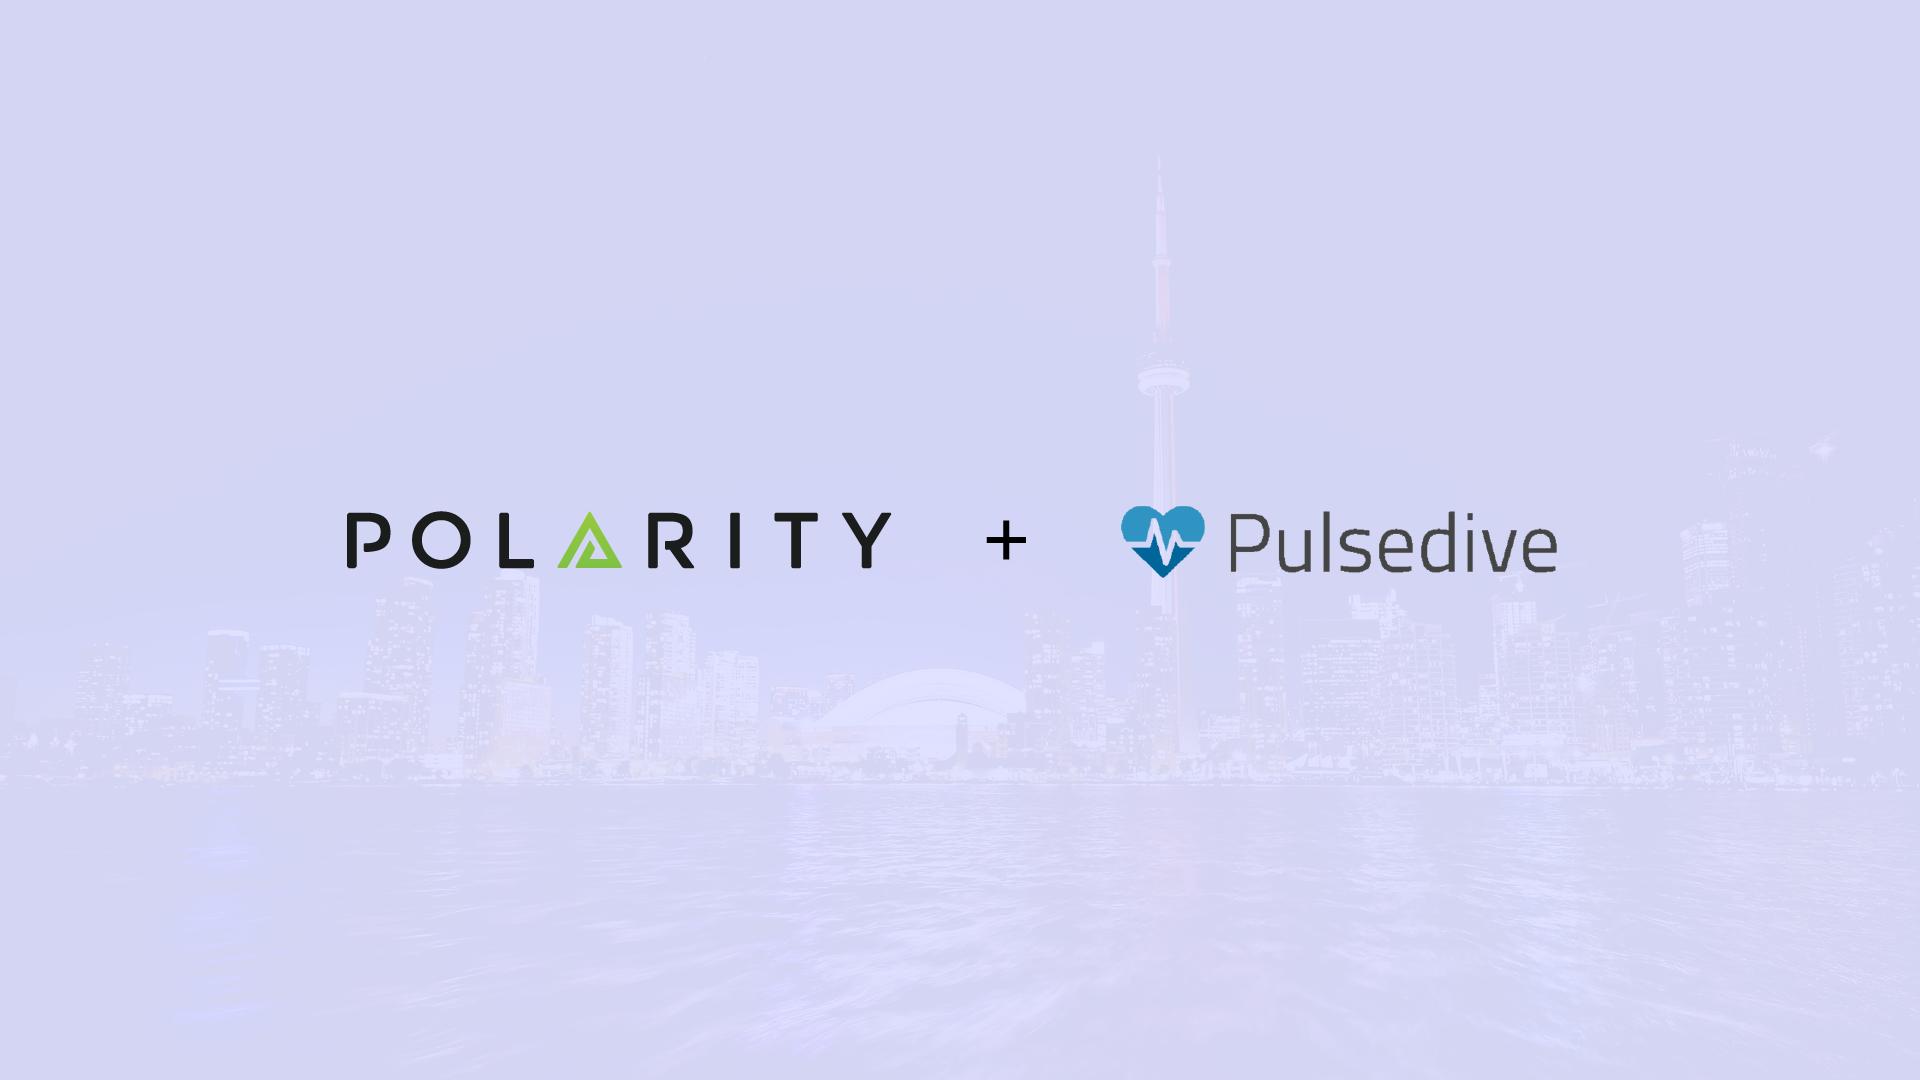 Polarity - Pulsedive Integration cover image